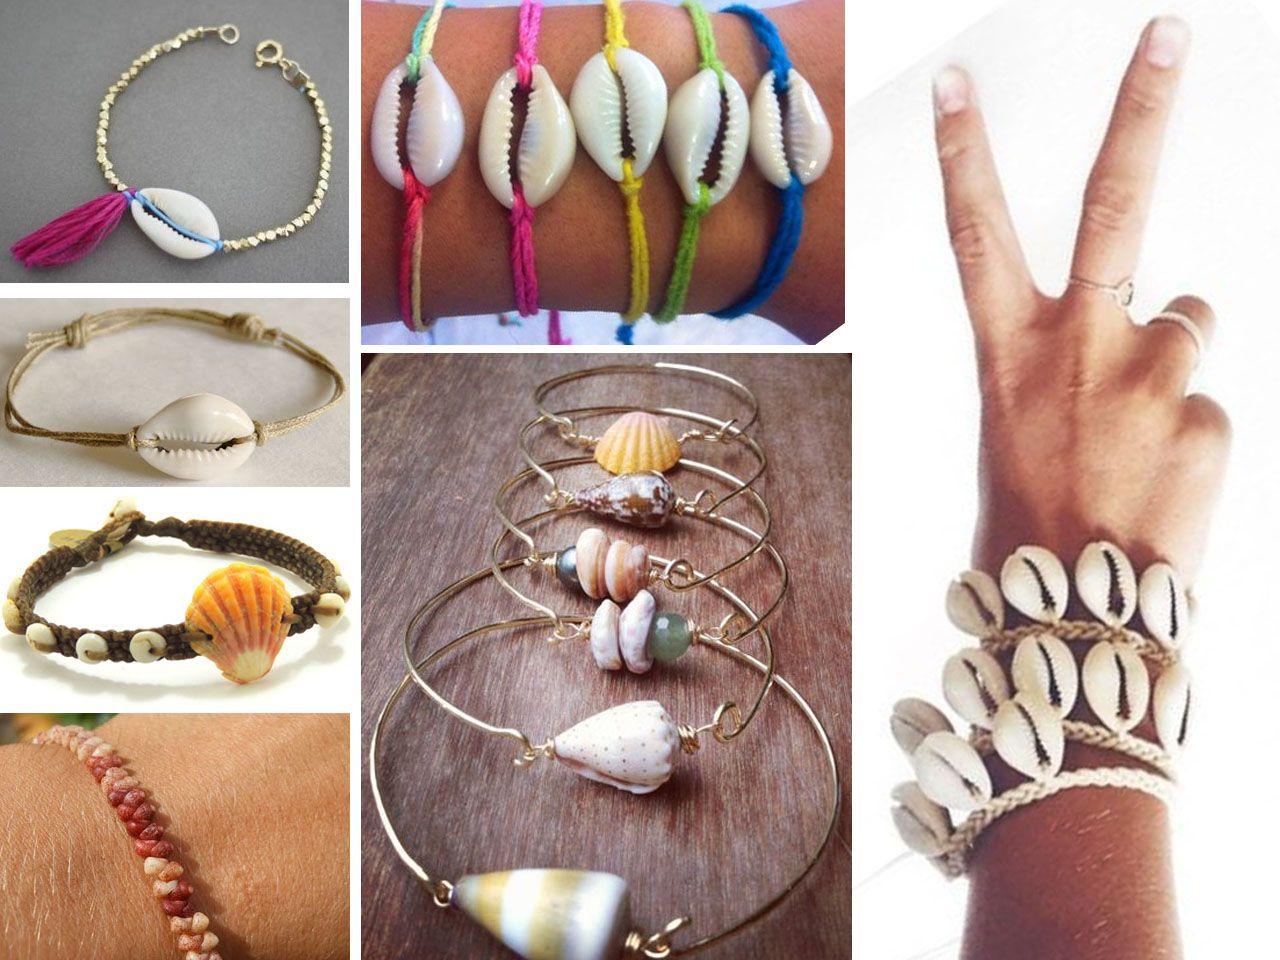 Fashion Jewelry Purposeful Tree Charm Hemp Bell Anklet Natural Macrame Handmade Ankle Bracelet Glass Beads